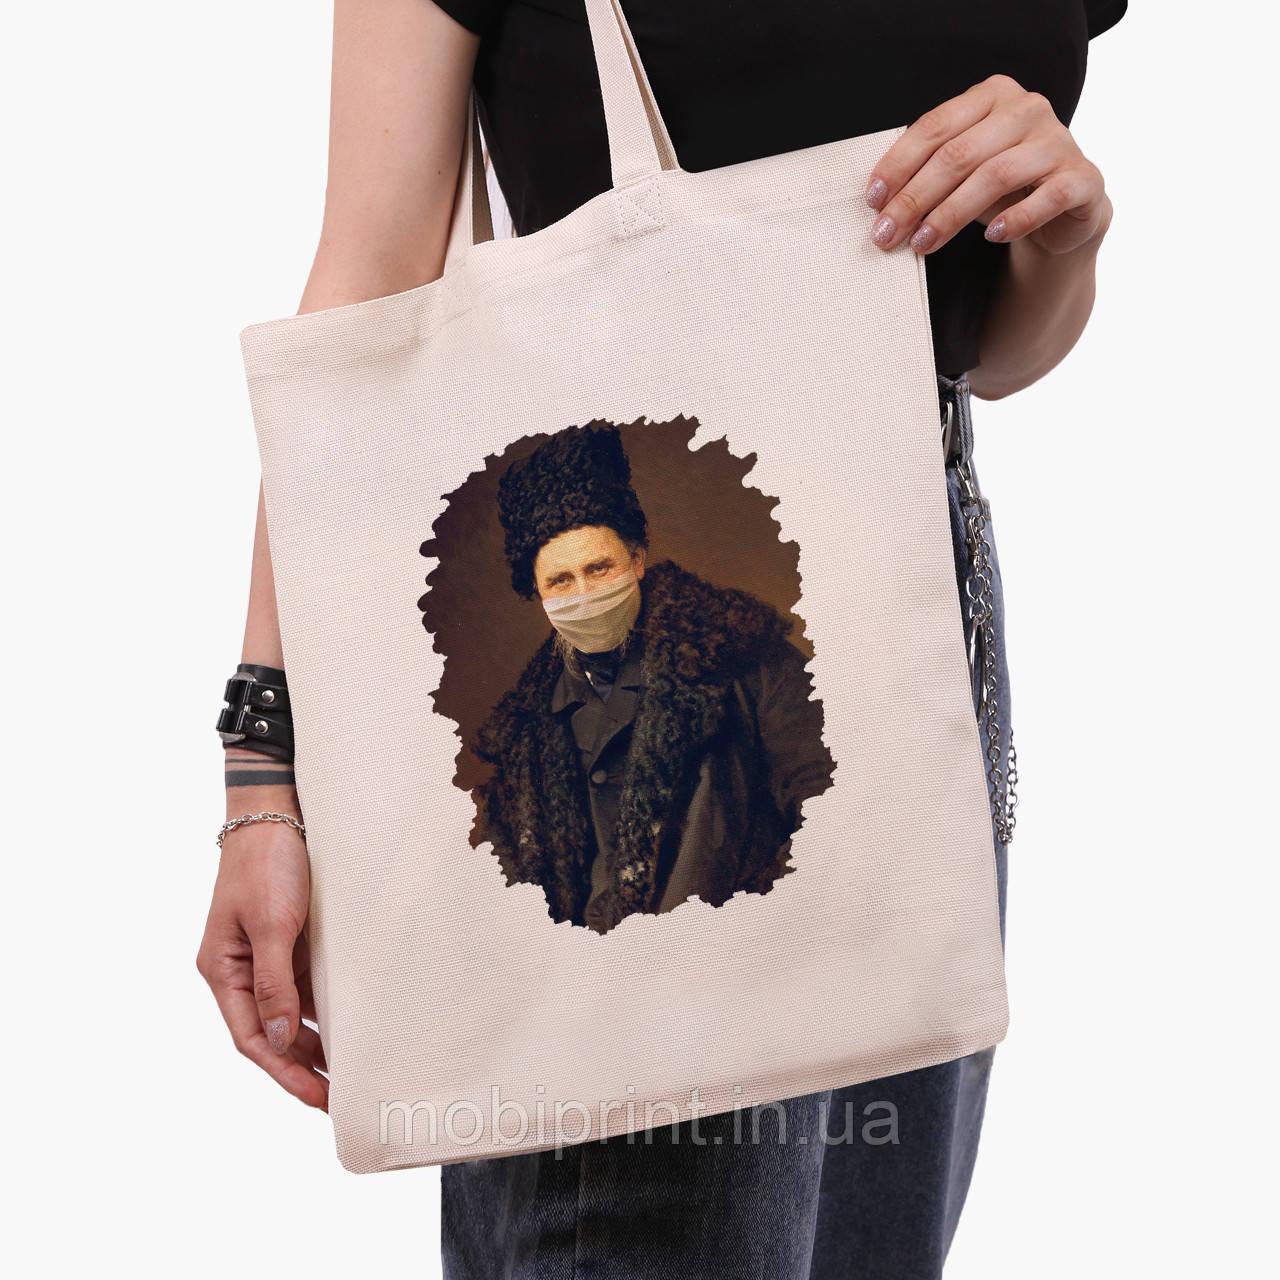 Эко сумка шоппер Тарас Шевченко (Taras Shevchenko) (9227-1427)  экосумка шопер 41*35 см